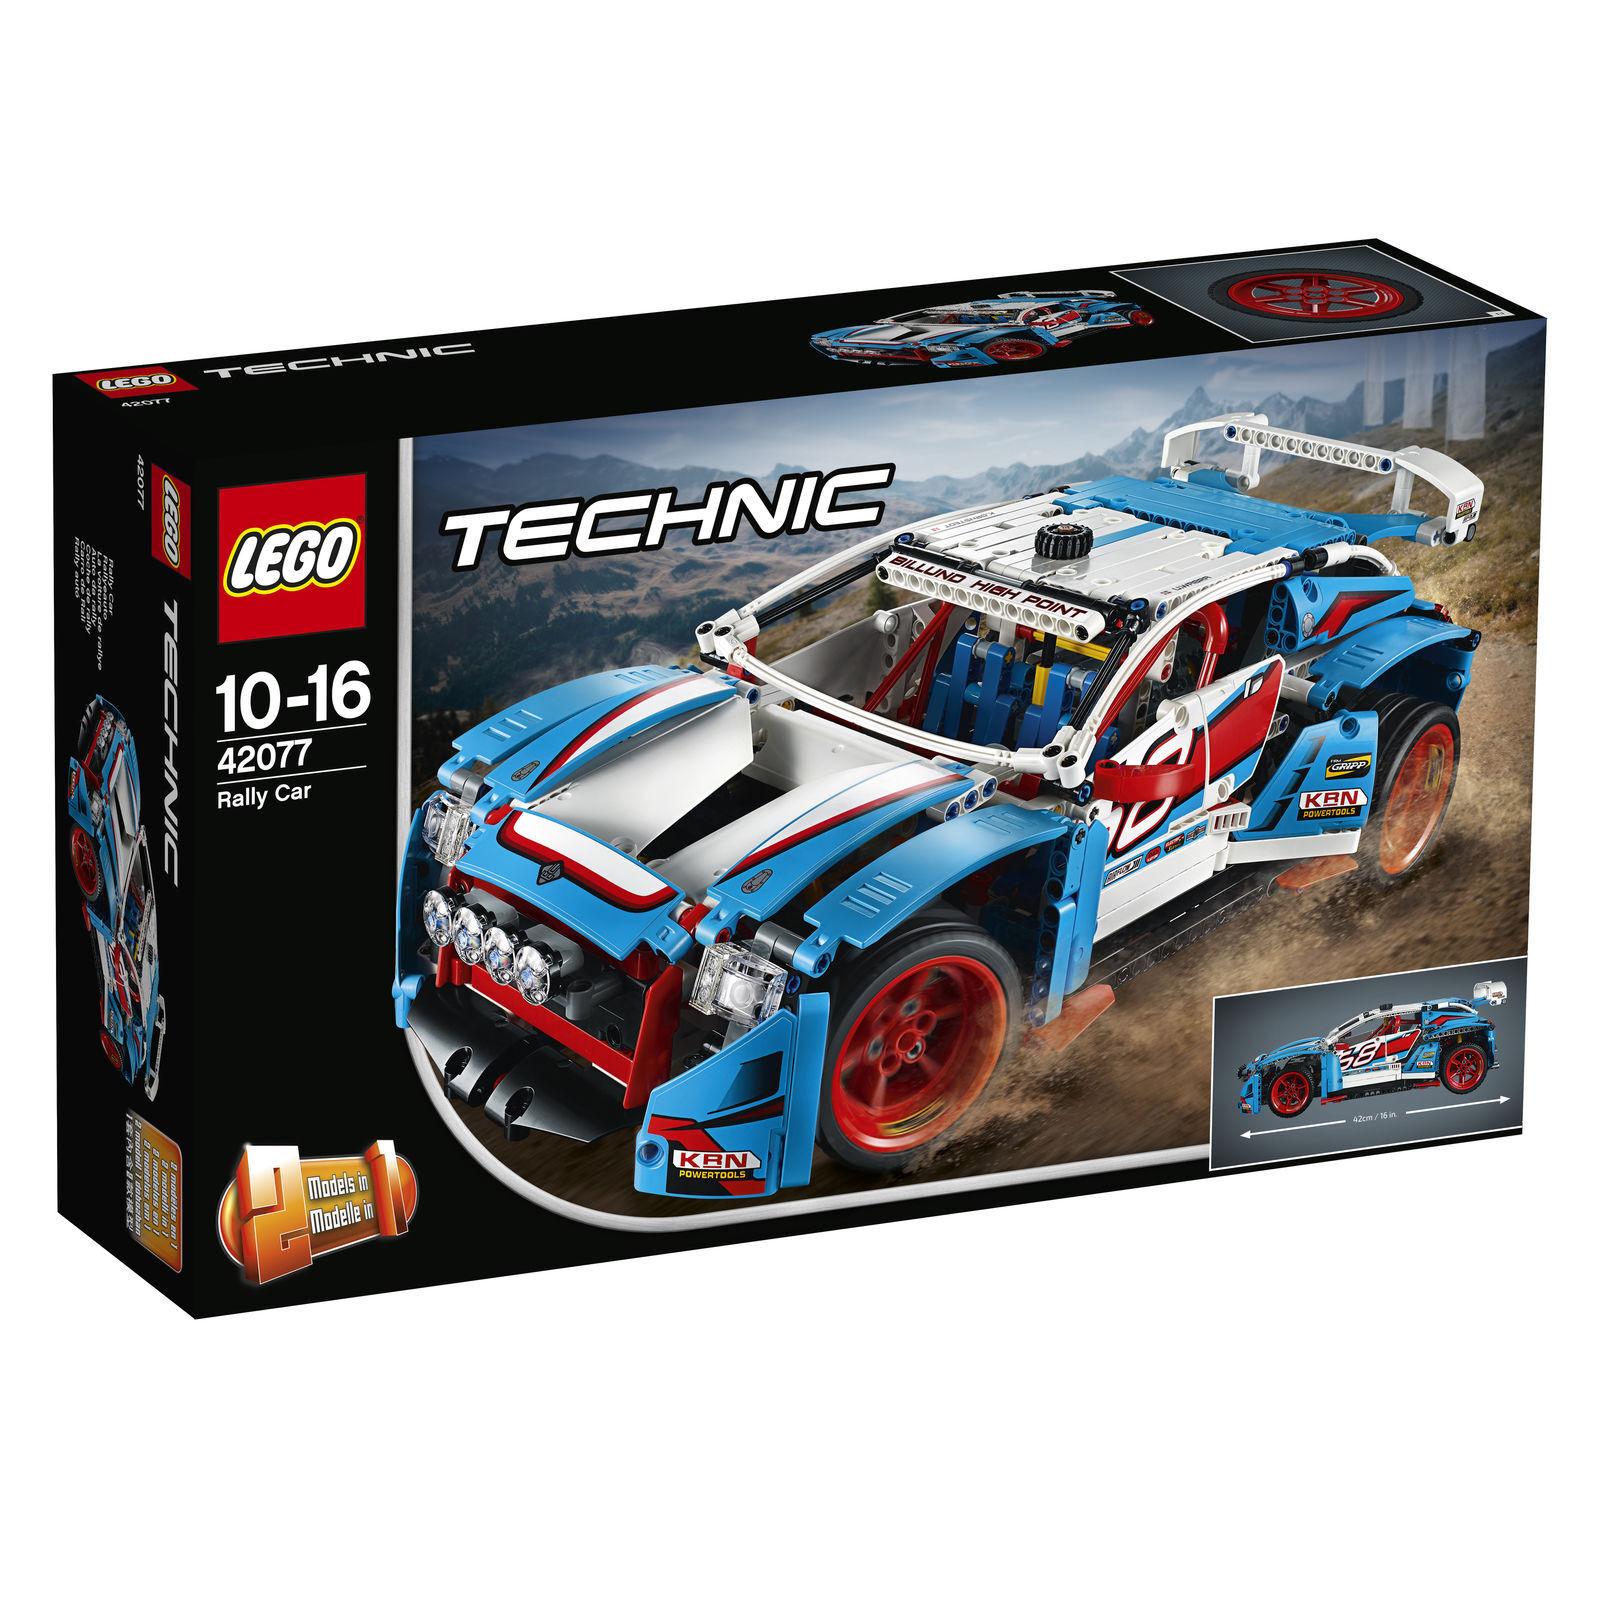 LEGO 42077 Technic Rallyeauto neu und OVP  | Outlet